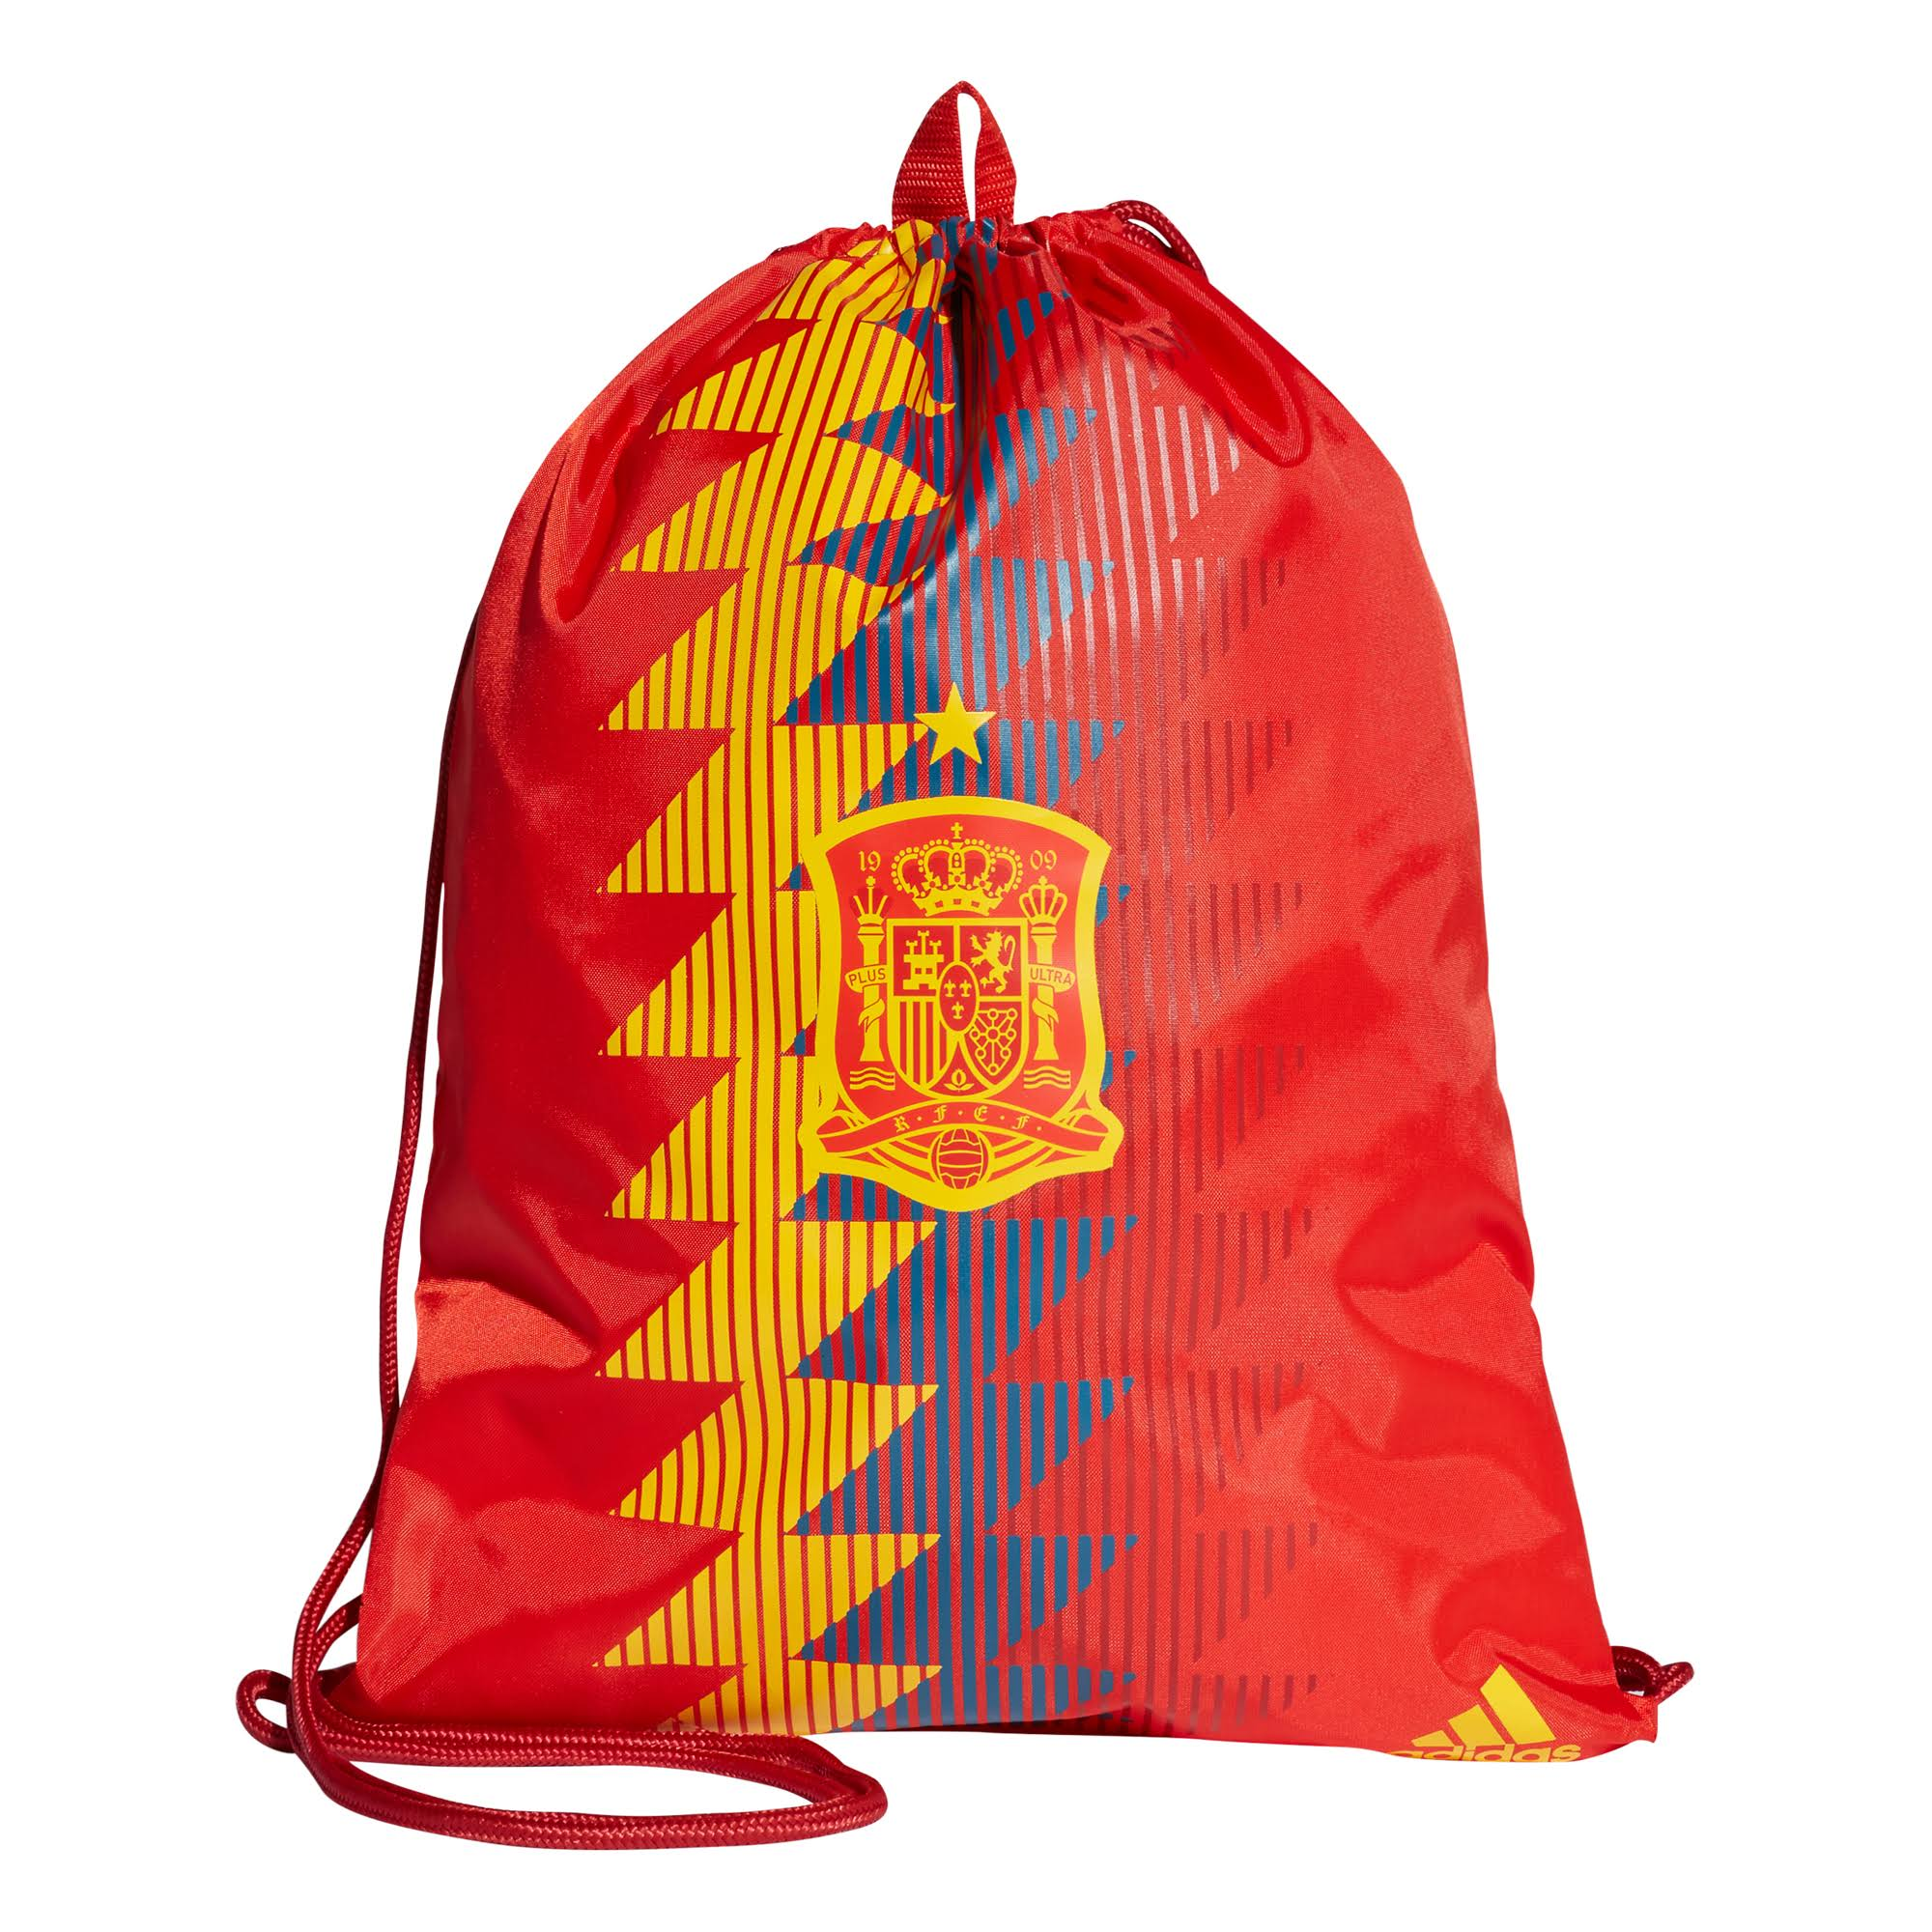 2018-2019 Spain Adidas Gym Bag (Red)